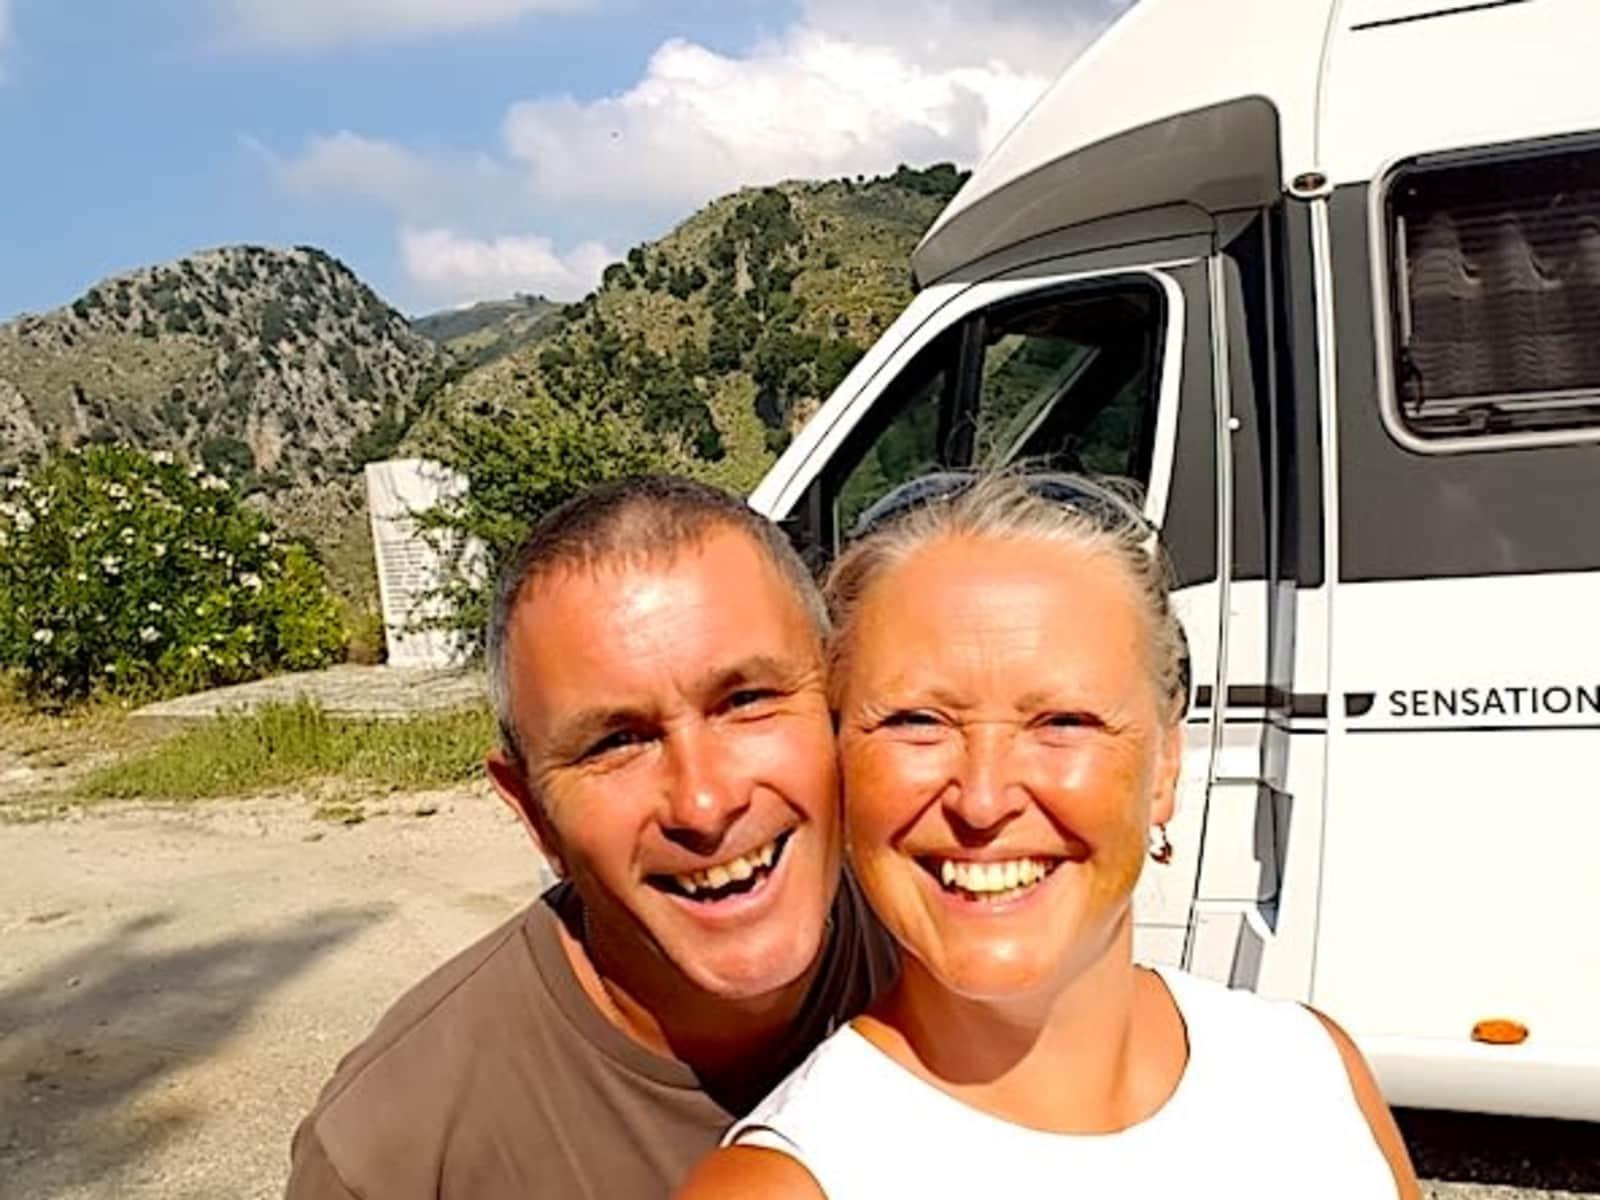 Karen & Myles from Siena, Italy